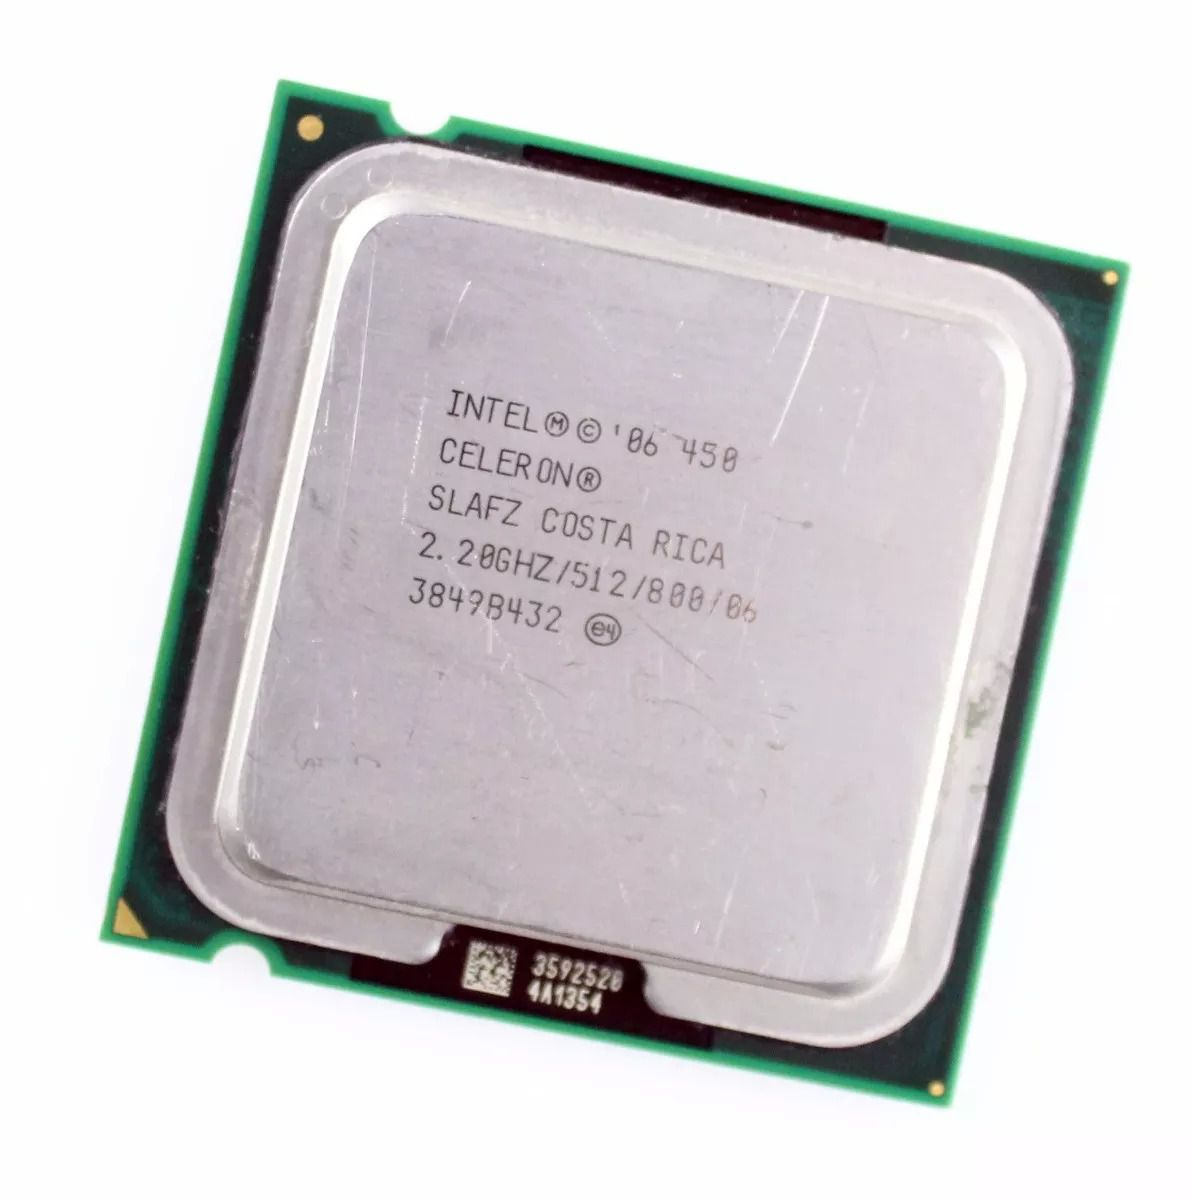 Processador Intel Celeron 450 512K Cache, 2.20 GHz LGA 775 OEM